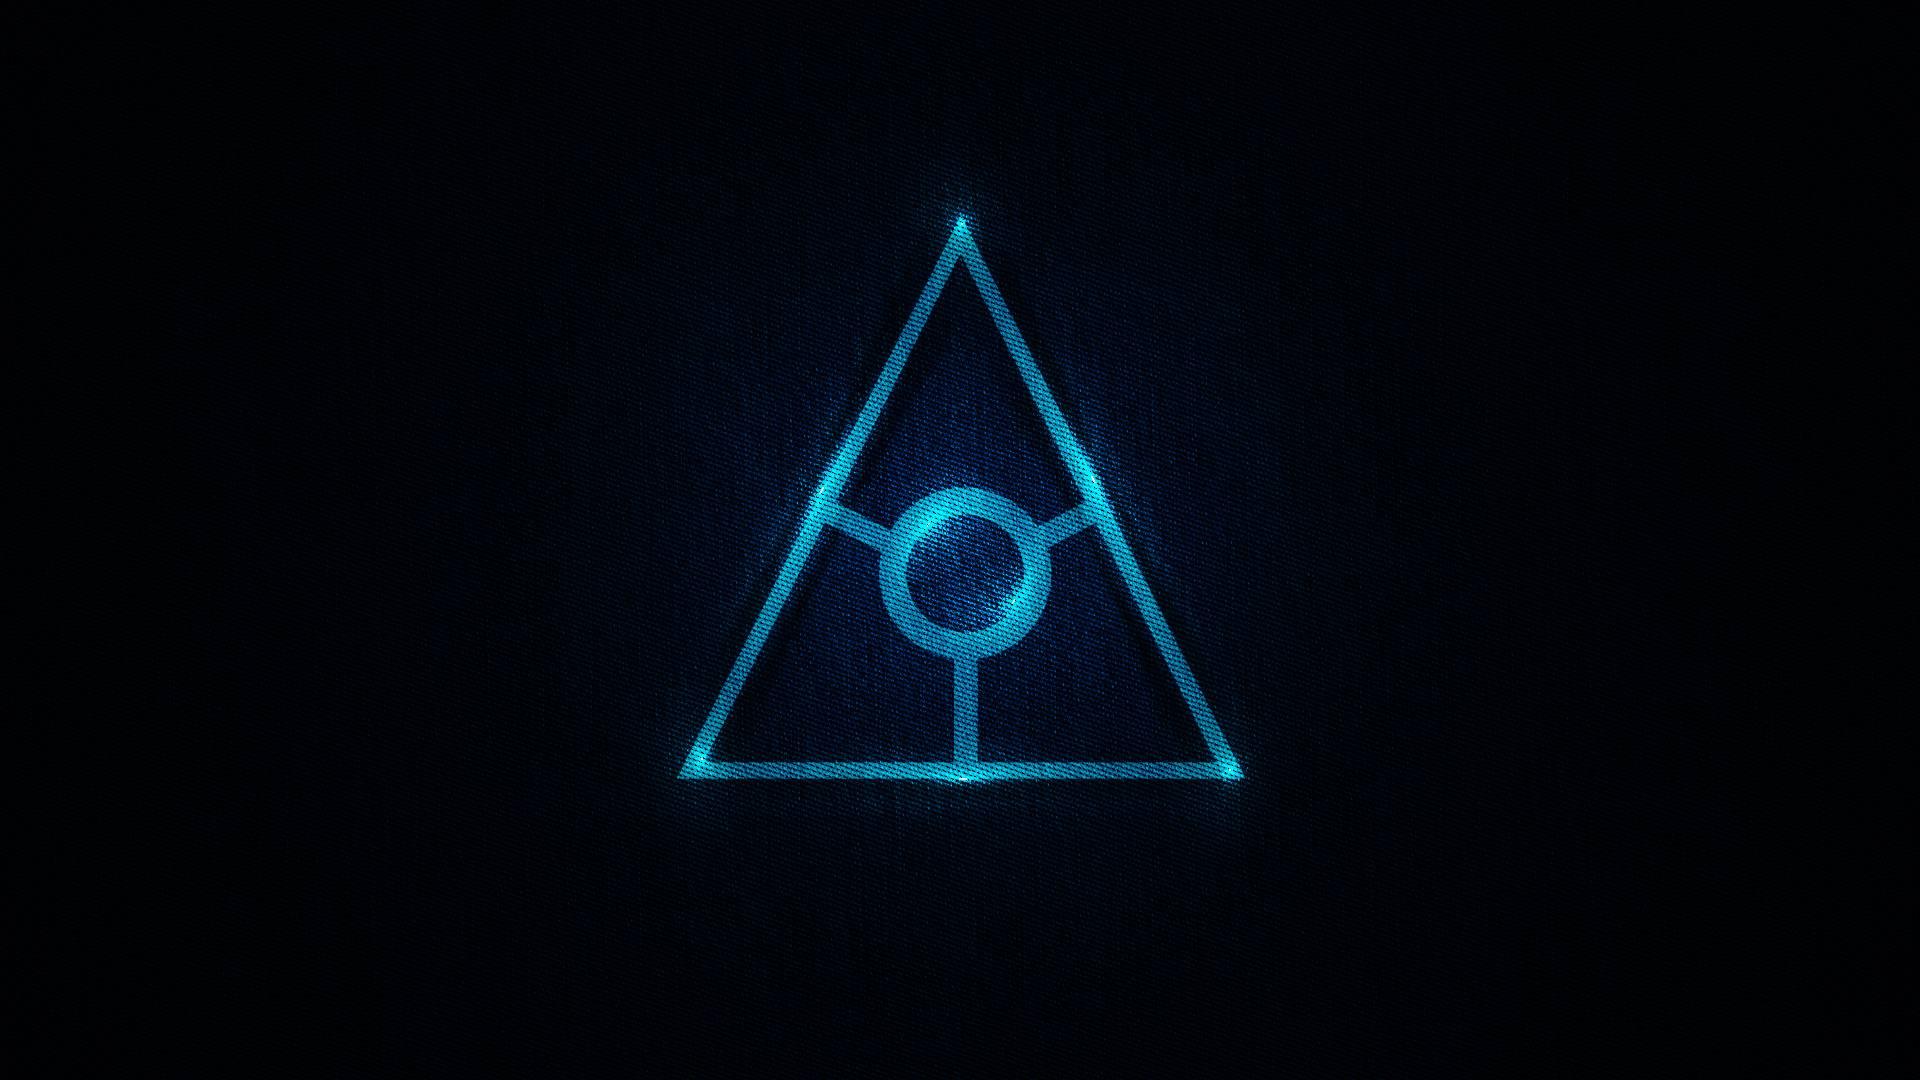 illuminati symbol wallpaper 1920x1080 - photo #2